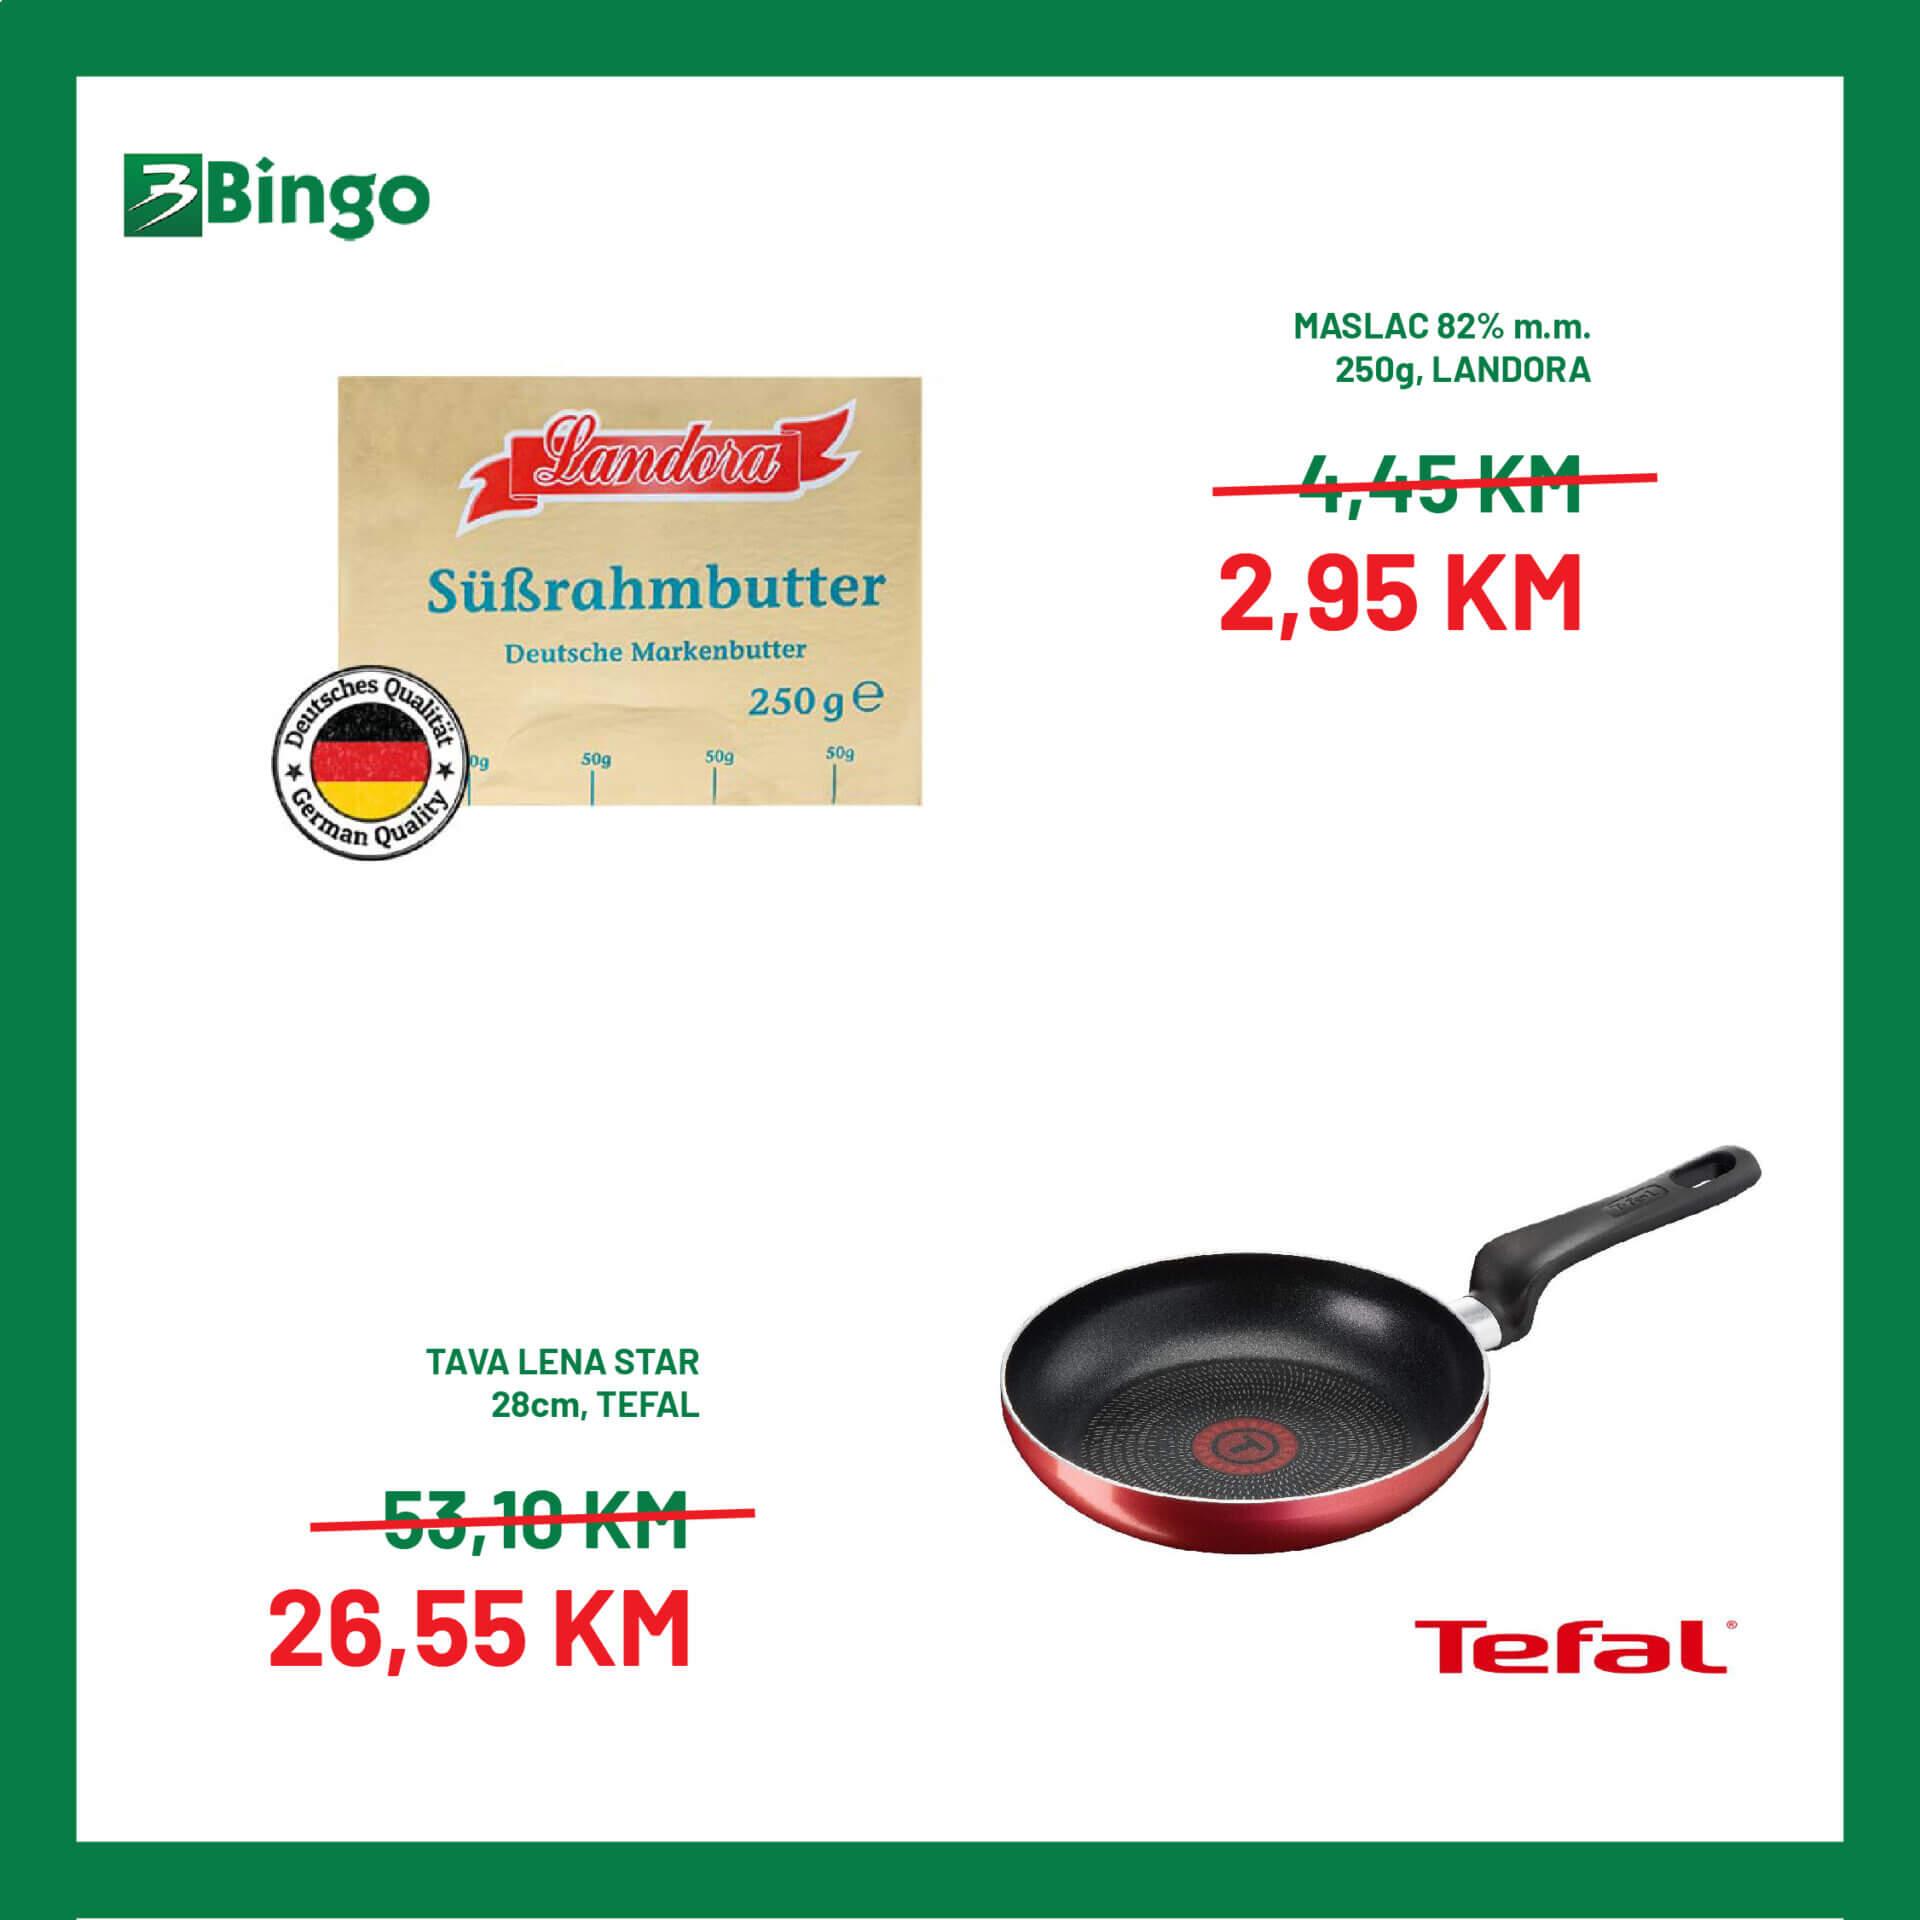 BINGO katalog Page 2